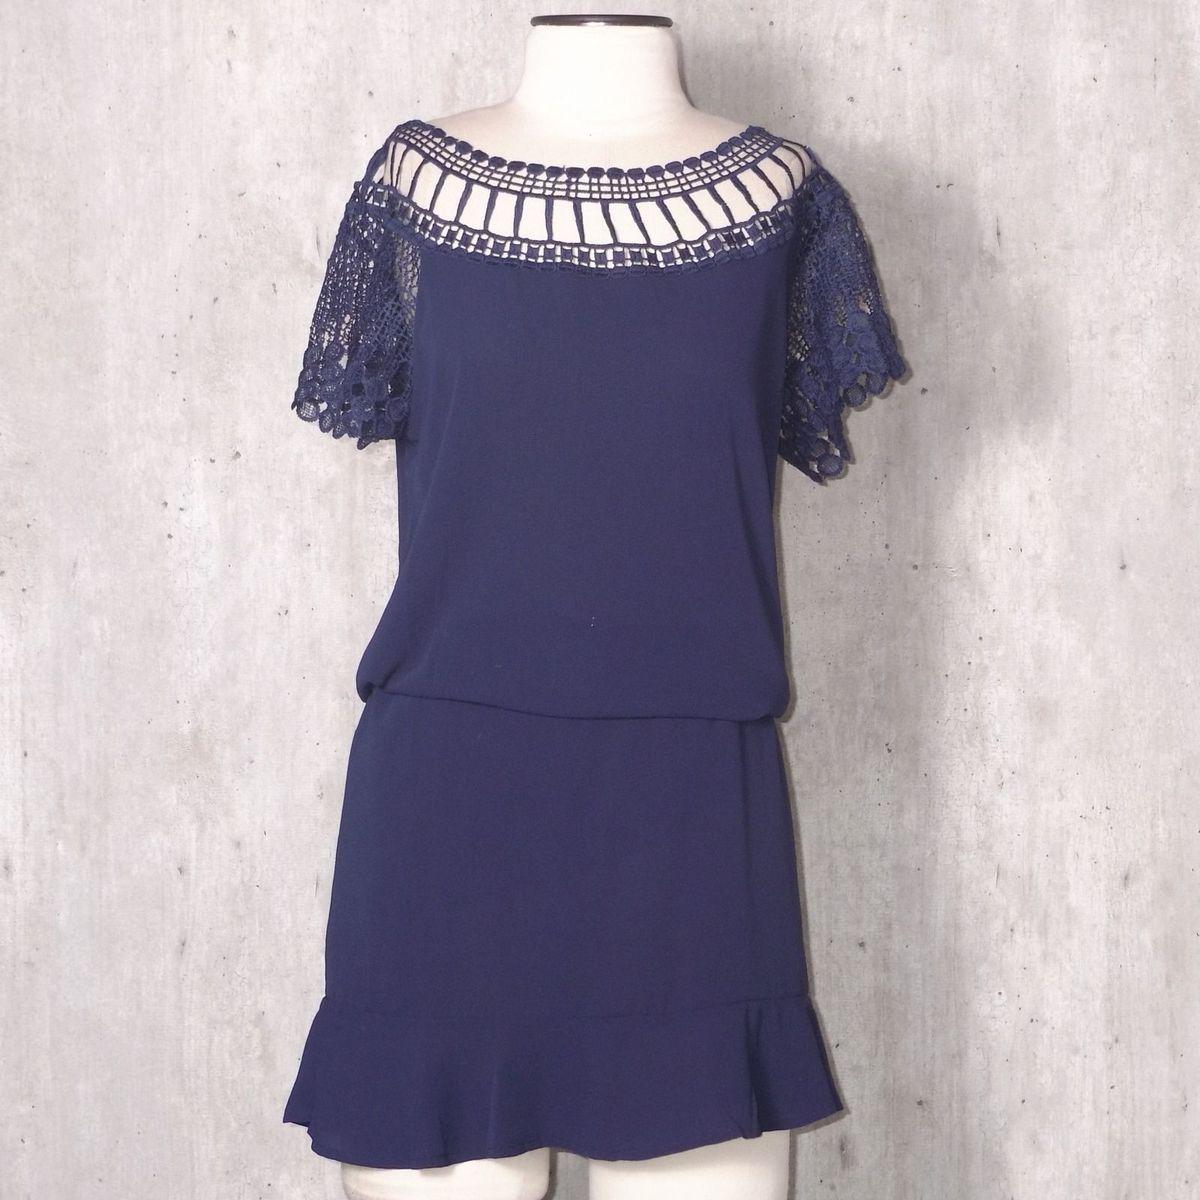 720d525cf Vestido Azul Marinho com Renda | Vestido Feminino Chifon Usado 31614689 |  enjoei